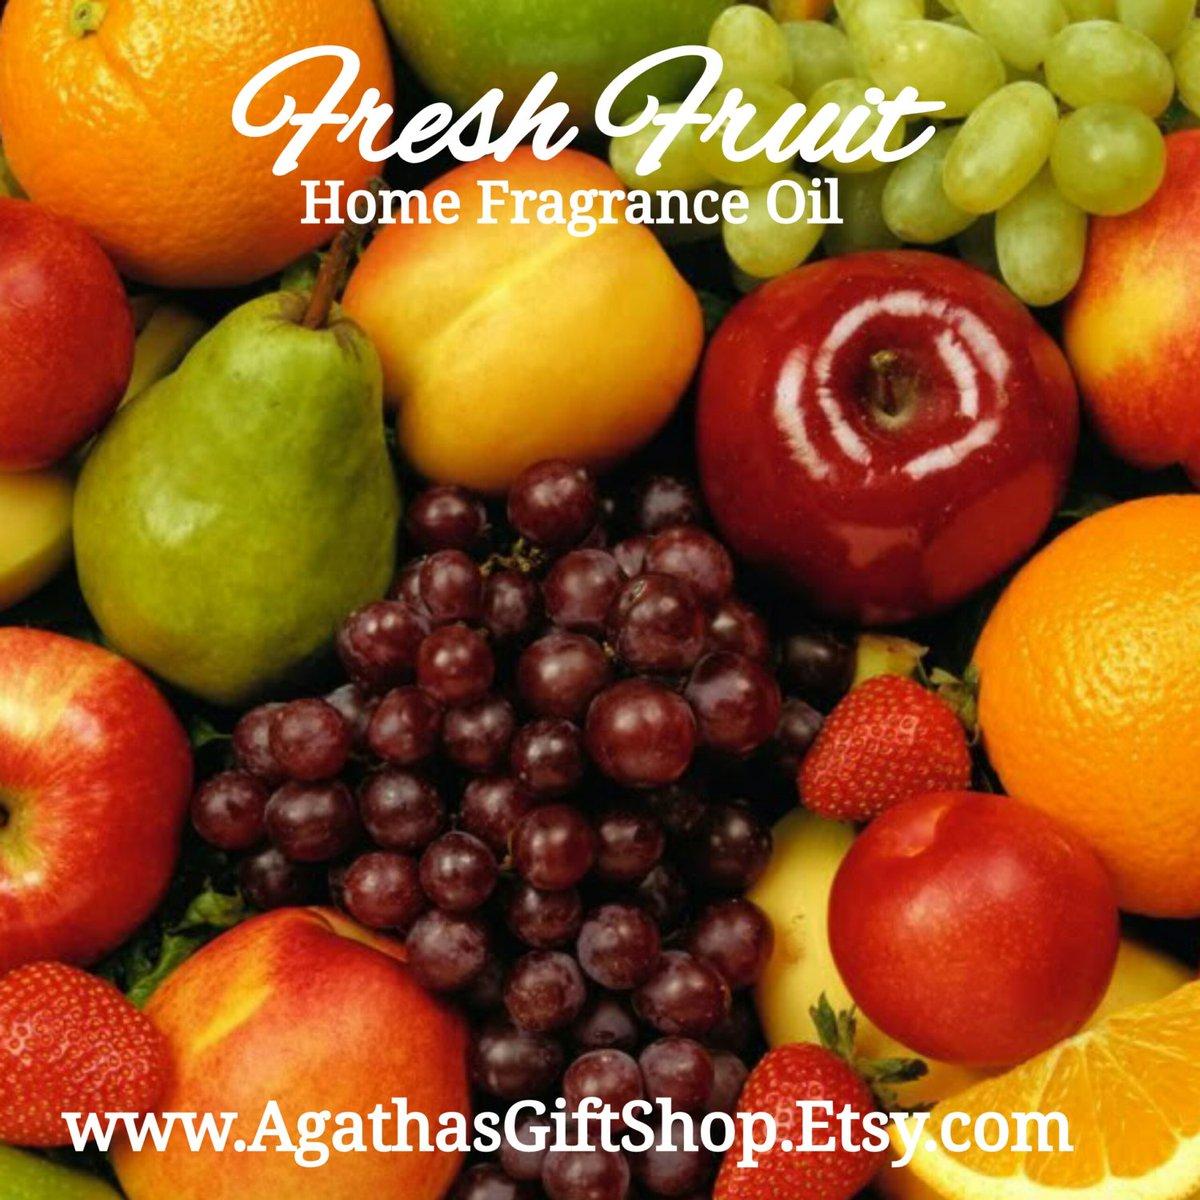 Fresh Fruit Home Fragrance Diffuser Warmer Aromatherapy Burning Oil  #AromatherapyOil #GiftShopSale #PerfumeBodyOils #Wedding #Incense #HomeFragranceOil #BlackFriday #HerbalRemedies #CyberMonday #Etsy #AromaOils